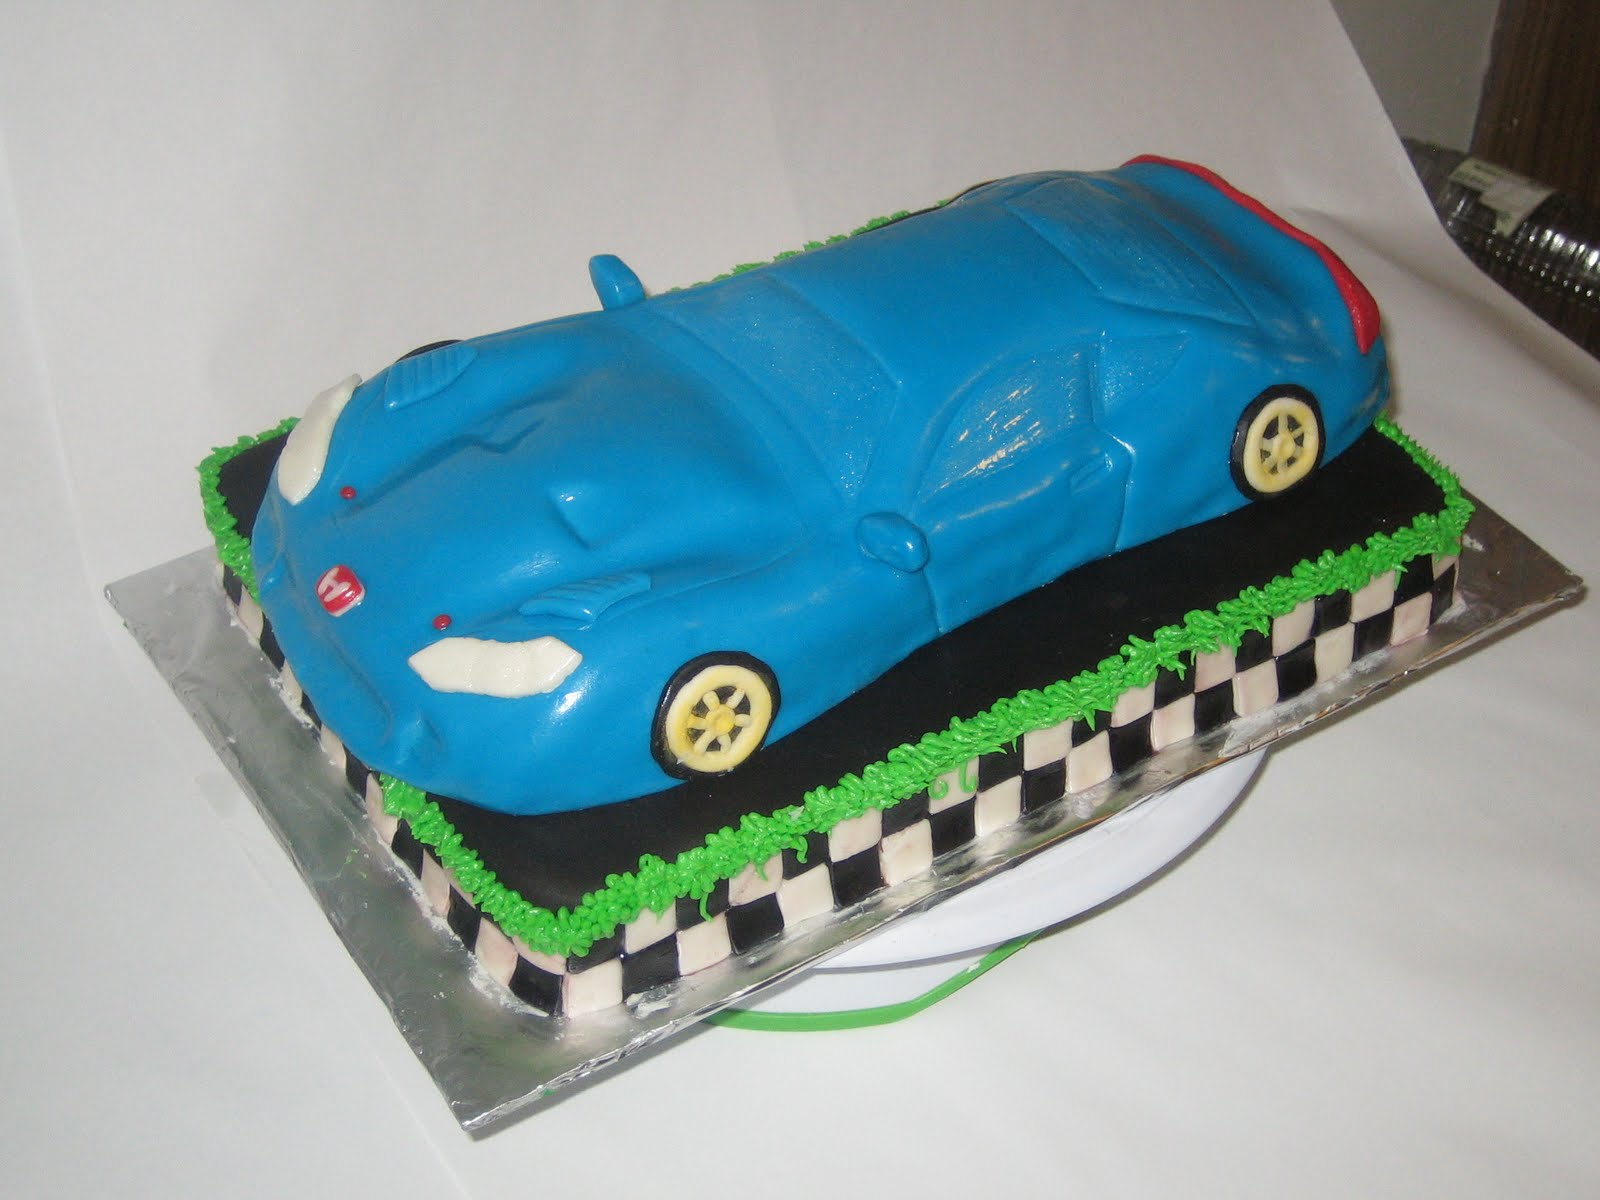 Easy Car Cake Design : Sweet & Simple - Custom Cake Design: Sports Car Cake ...